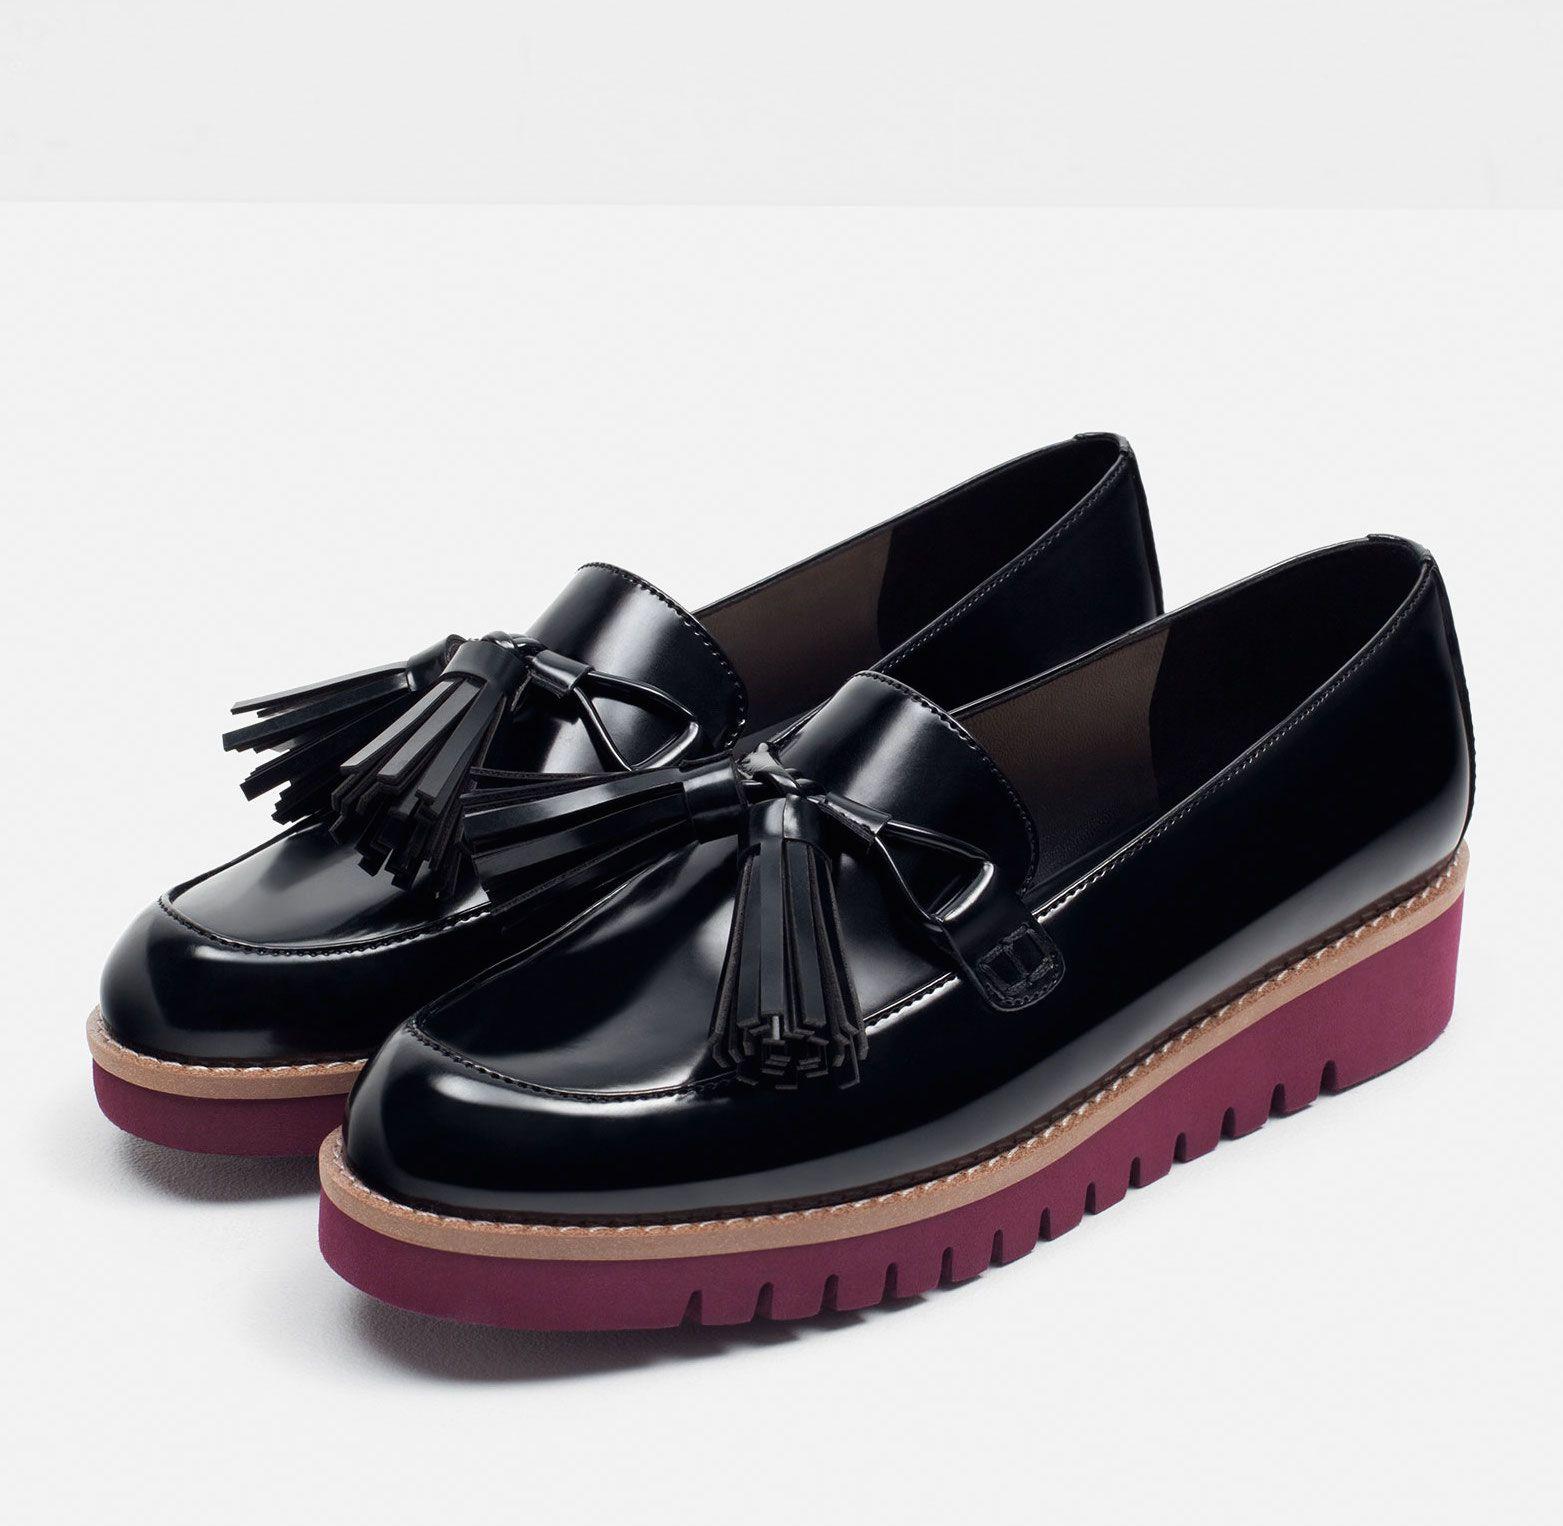 35535b79174 Zara Tasseled Platform Loafers More